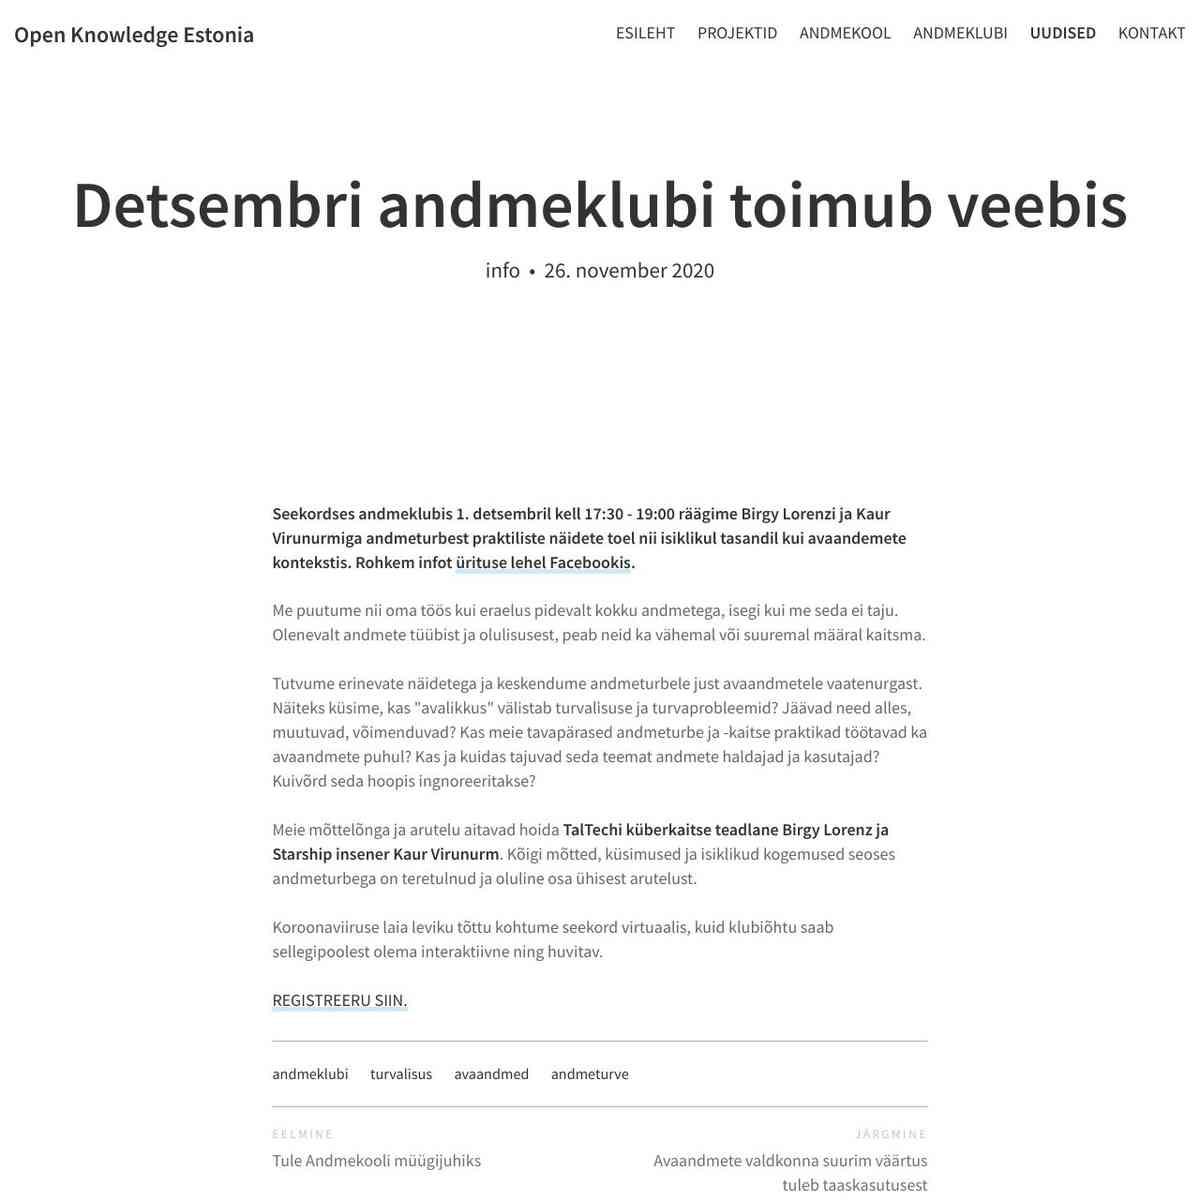 Detsembri andmeklubi toimub veebis – Open Knowledge Estonia